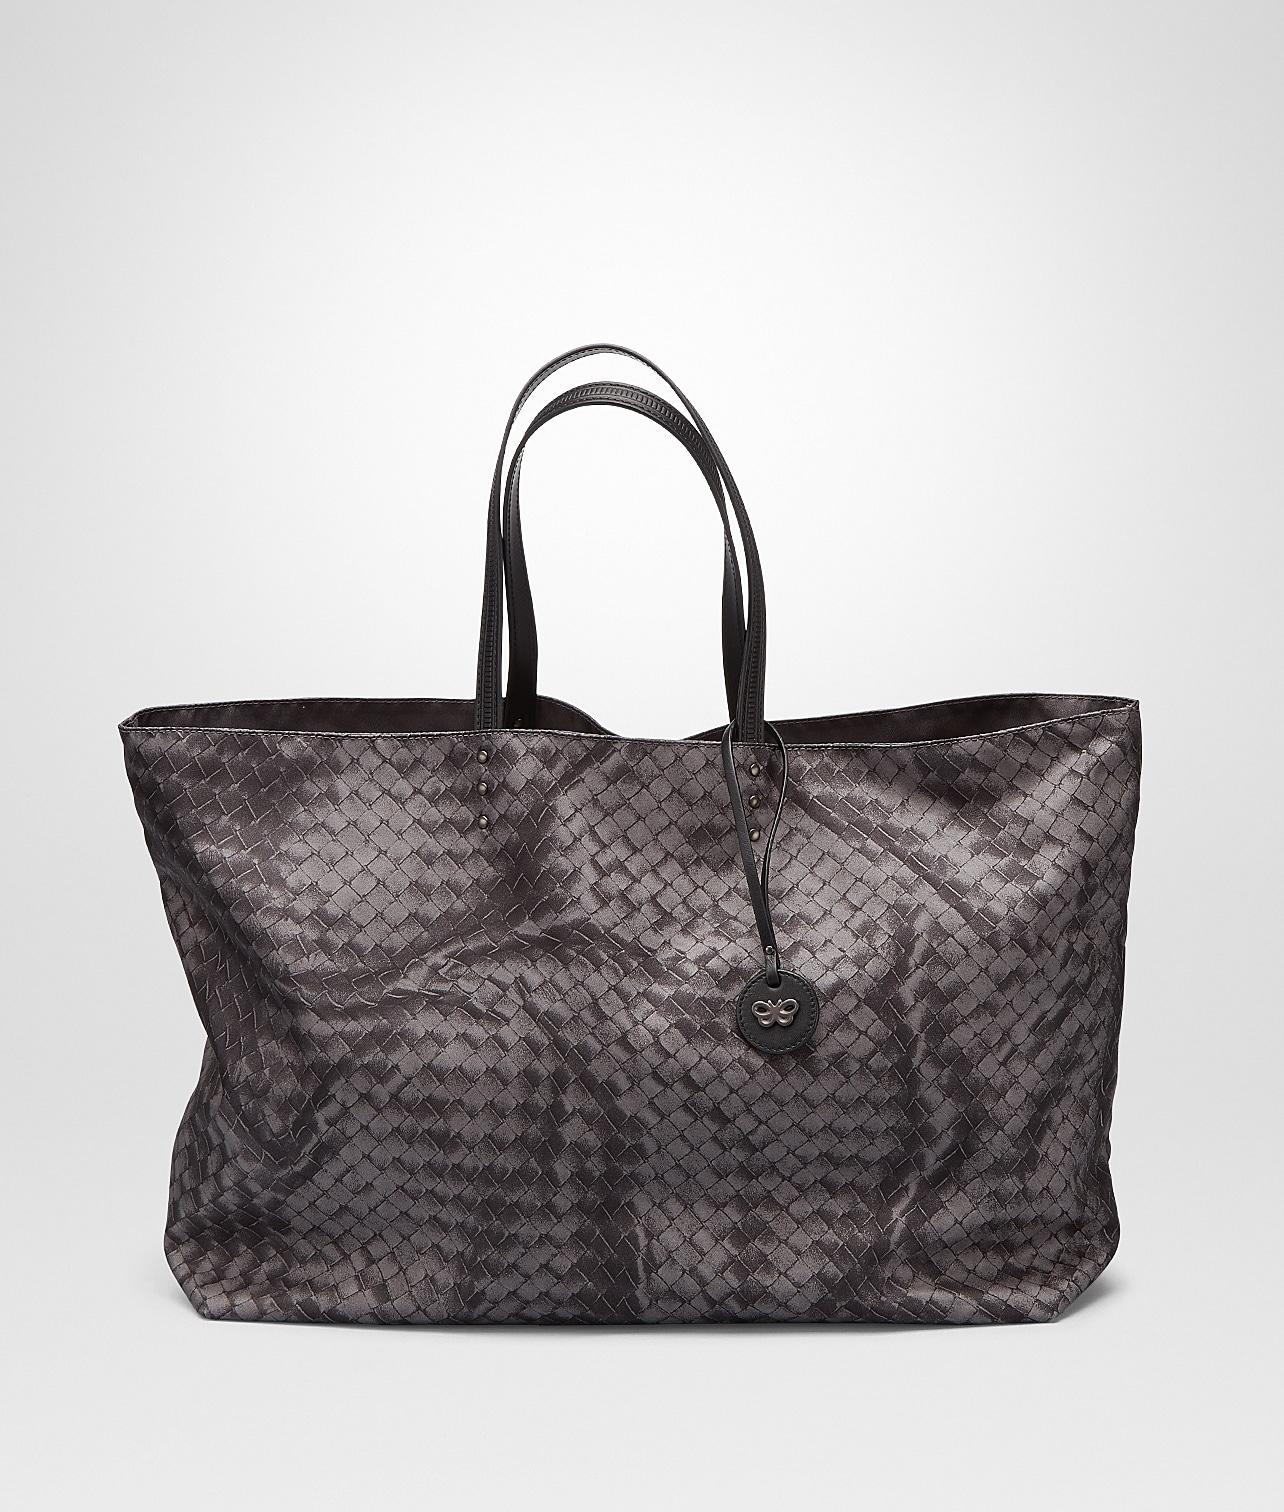 Bottega Veneta New Light Grey Intrecciolusion Tote Large Bag 3d0f8d3a144da